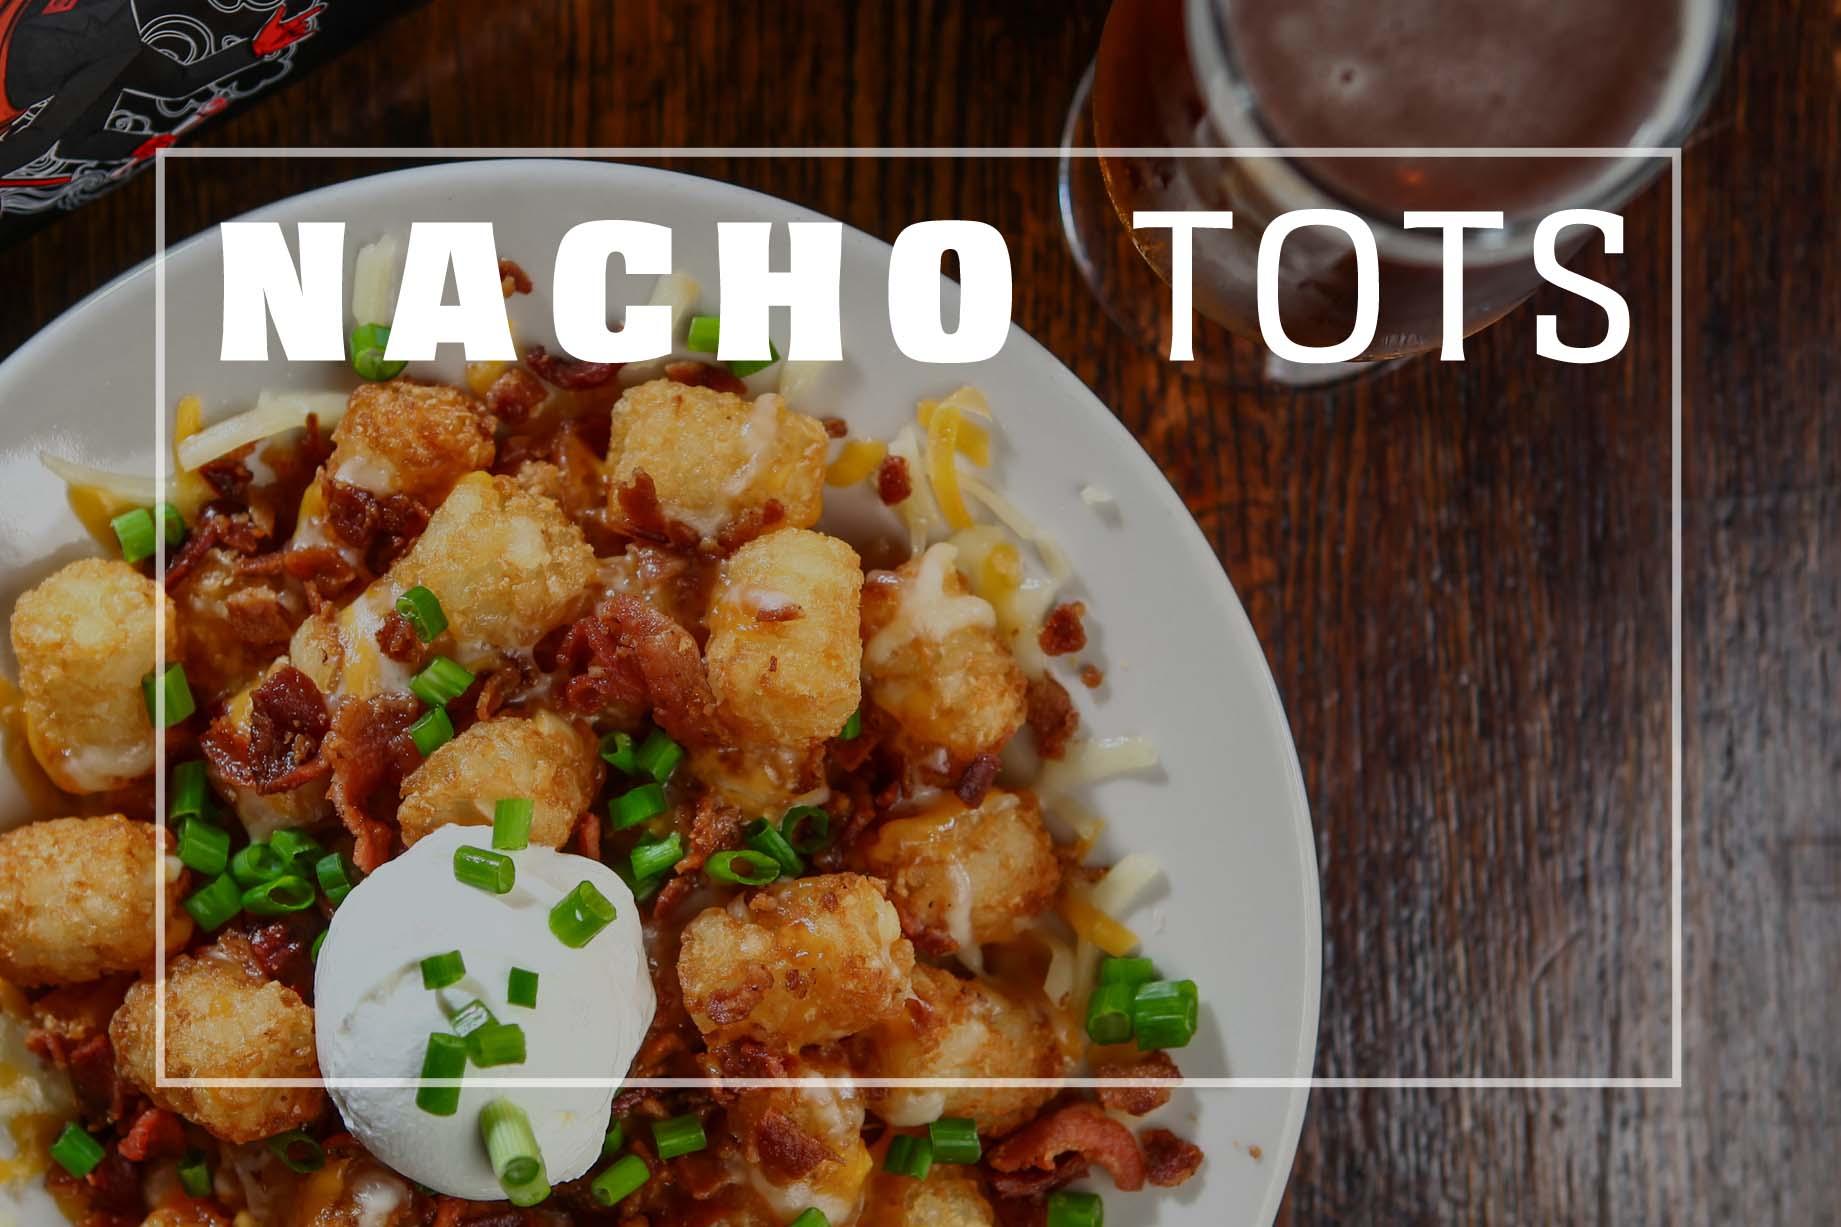 Nacho Tots